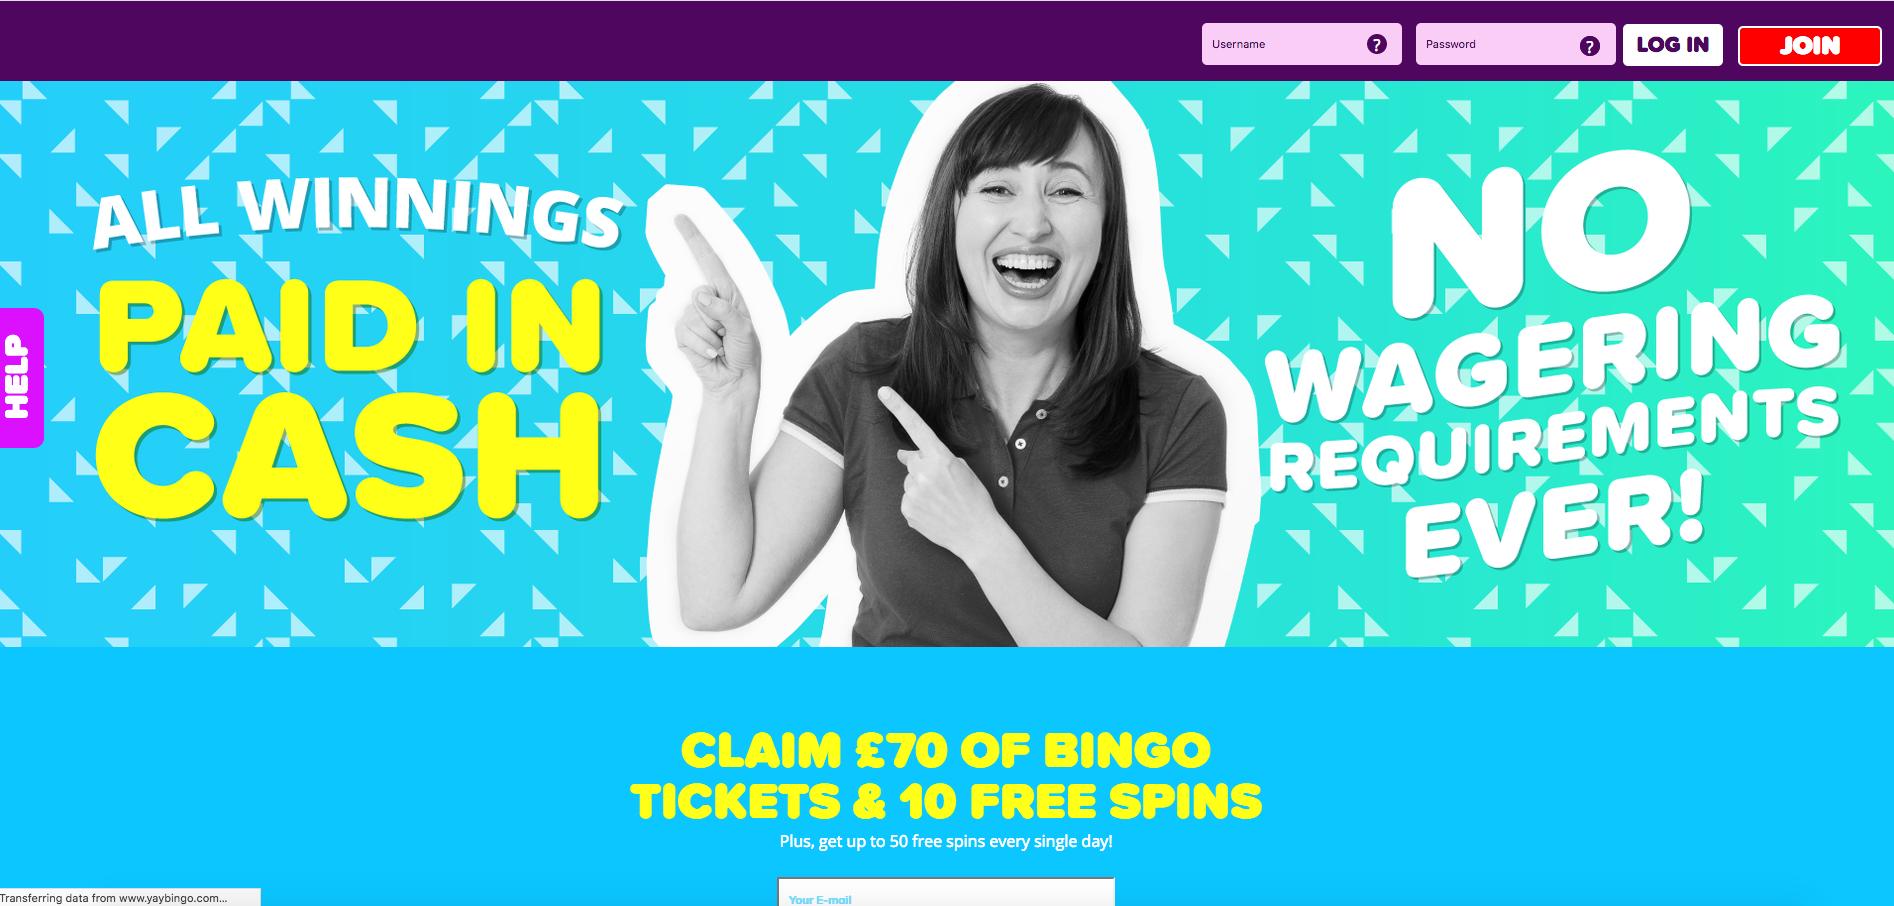 Yay Bingo Lobby